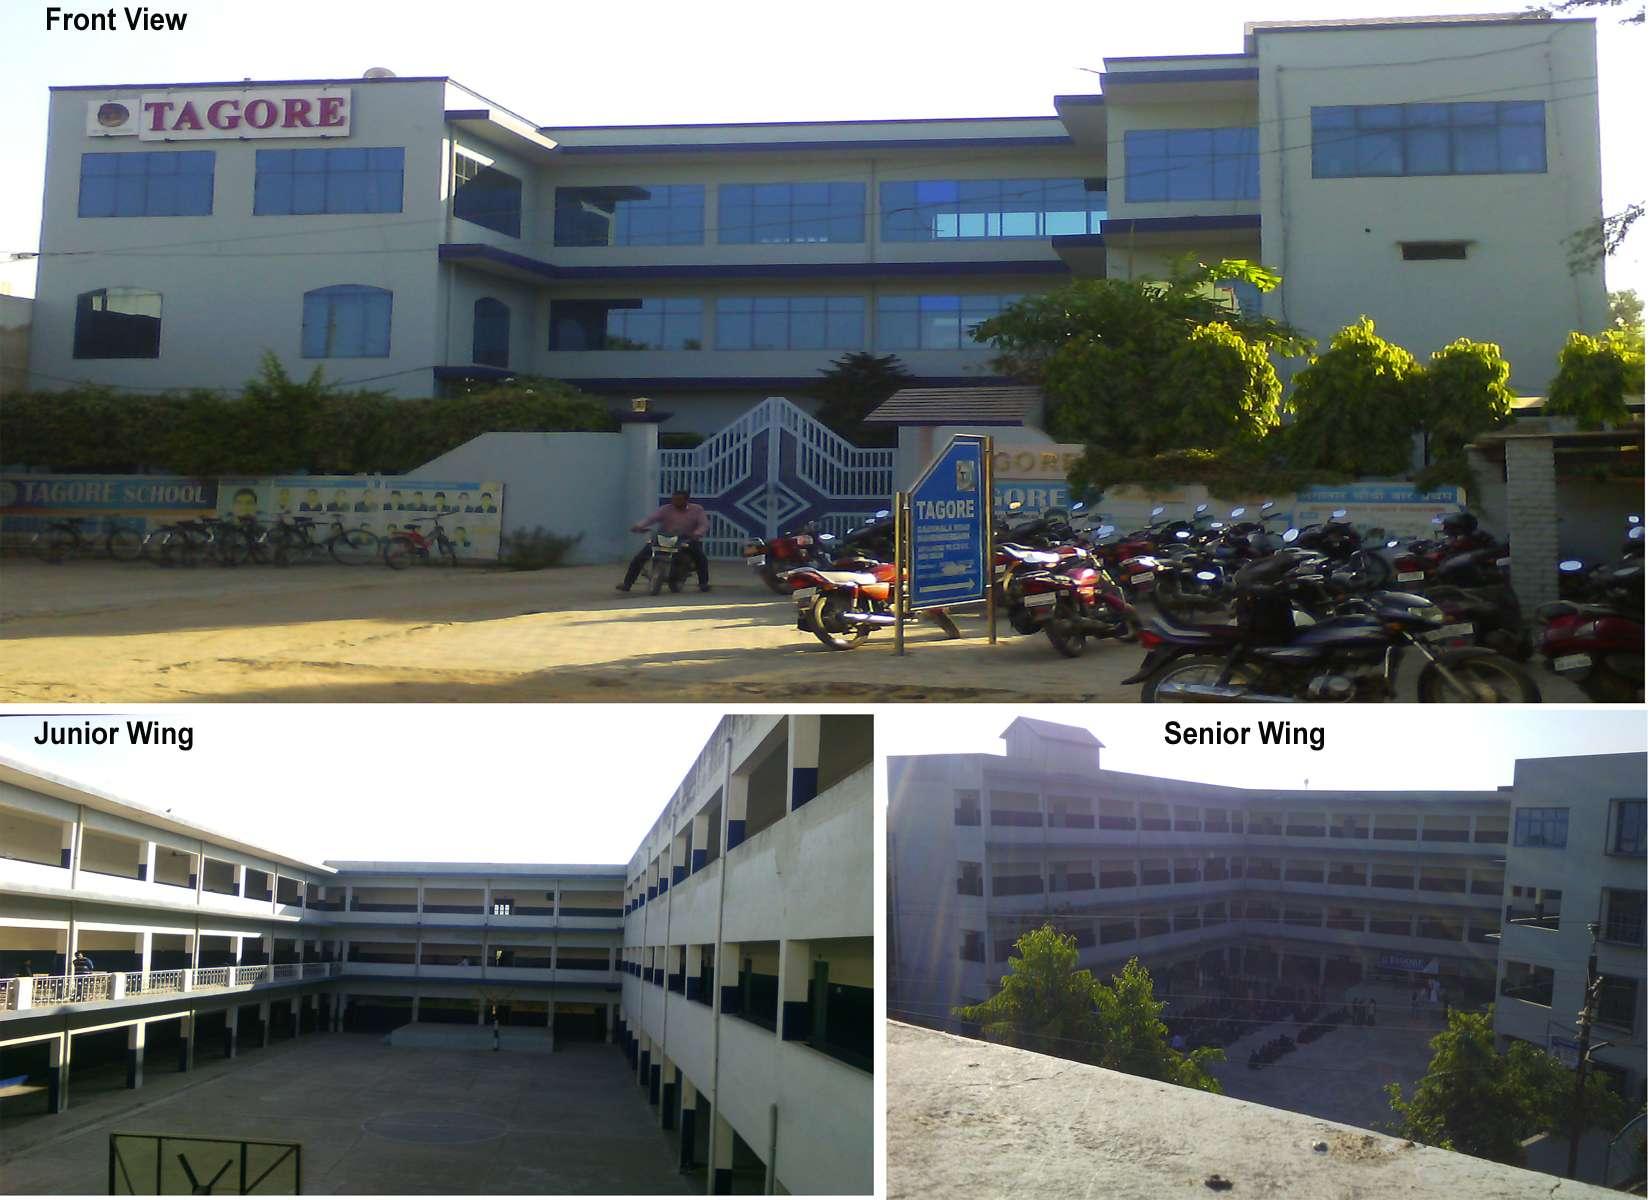 Tagore sr sec school Majra khurd mahendergarh 530826